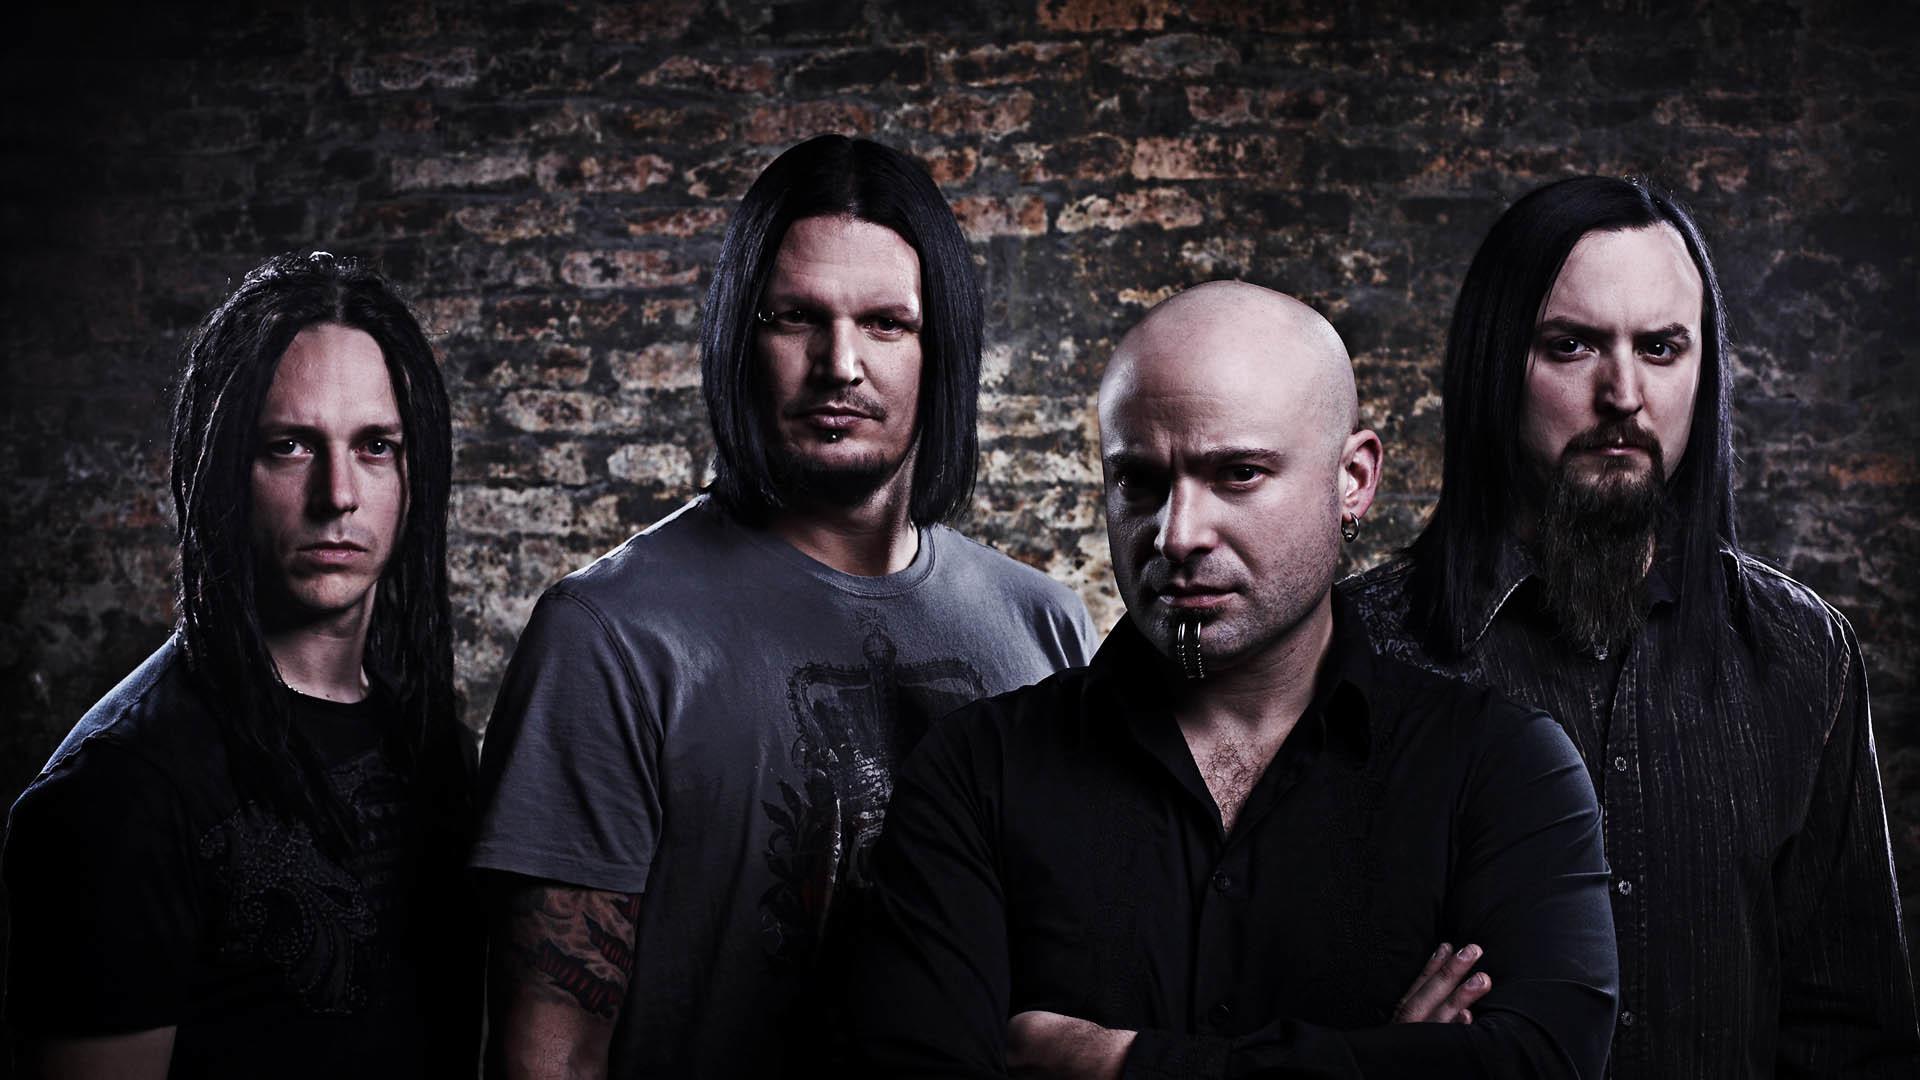 Music – Disturbed Disturbed (Band) Wallpaper